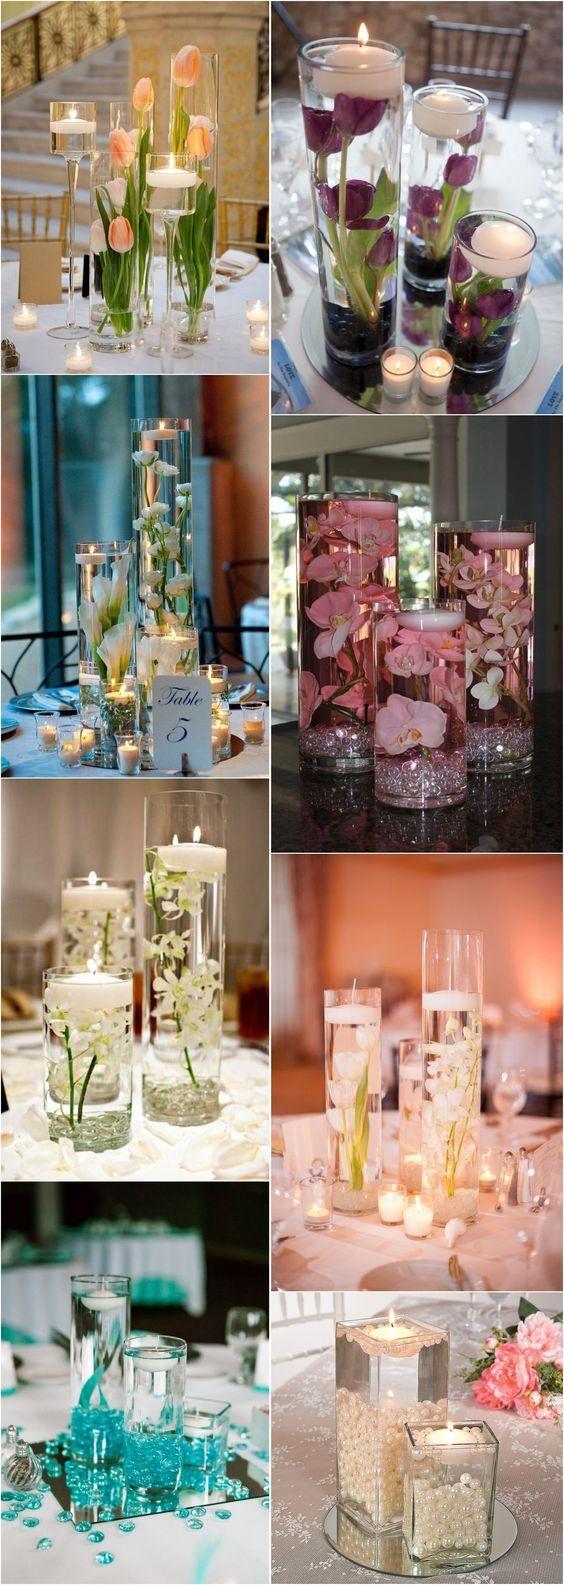 Best 25 Candy Centerpieces Wedding Ideas On Pinterest